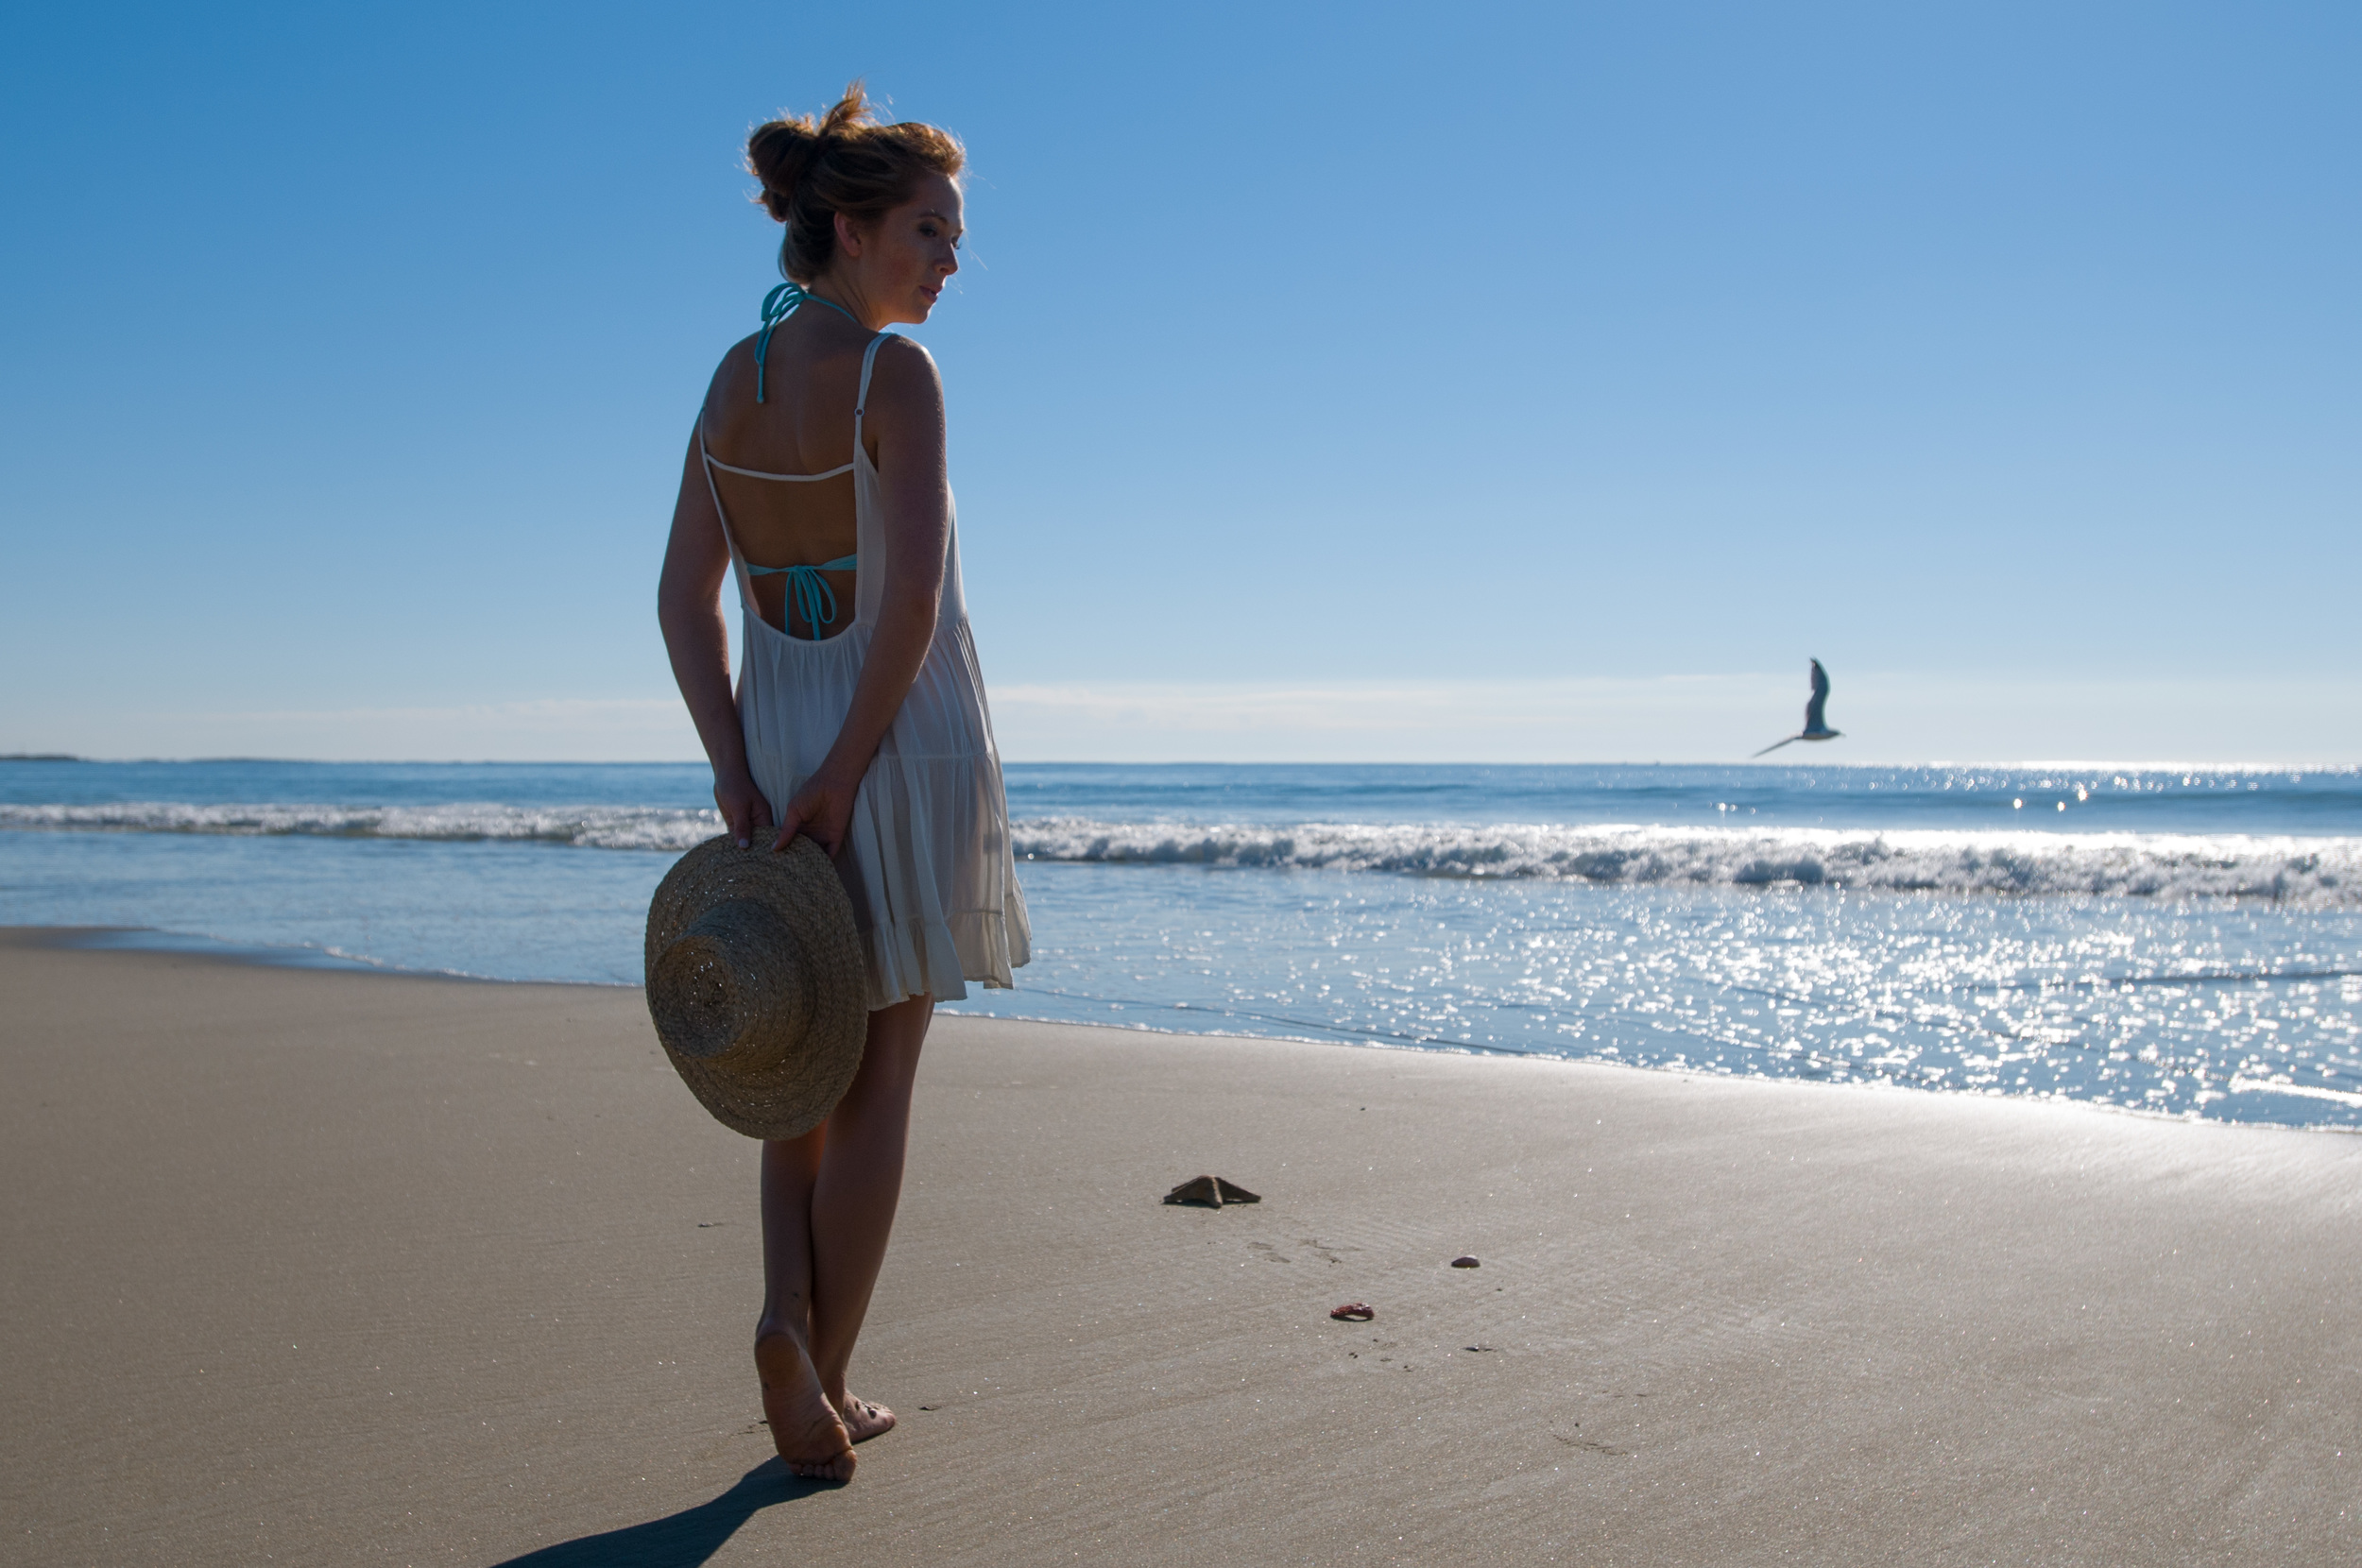 Walk On The Beach 0863.JPG